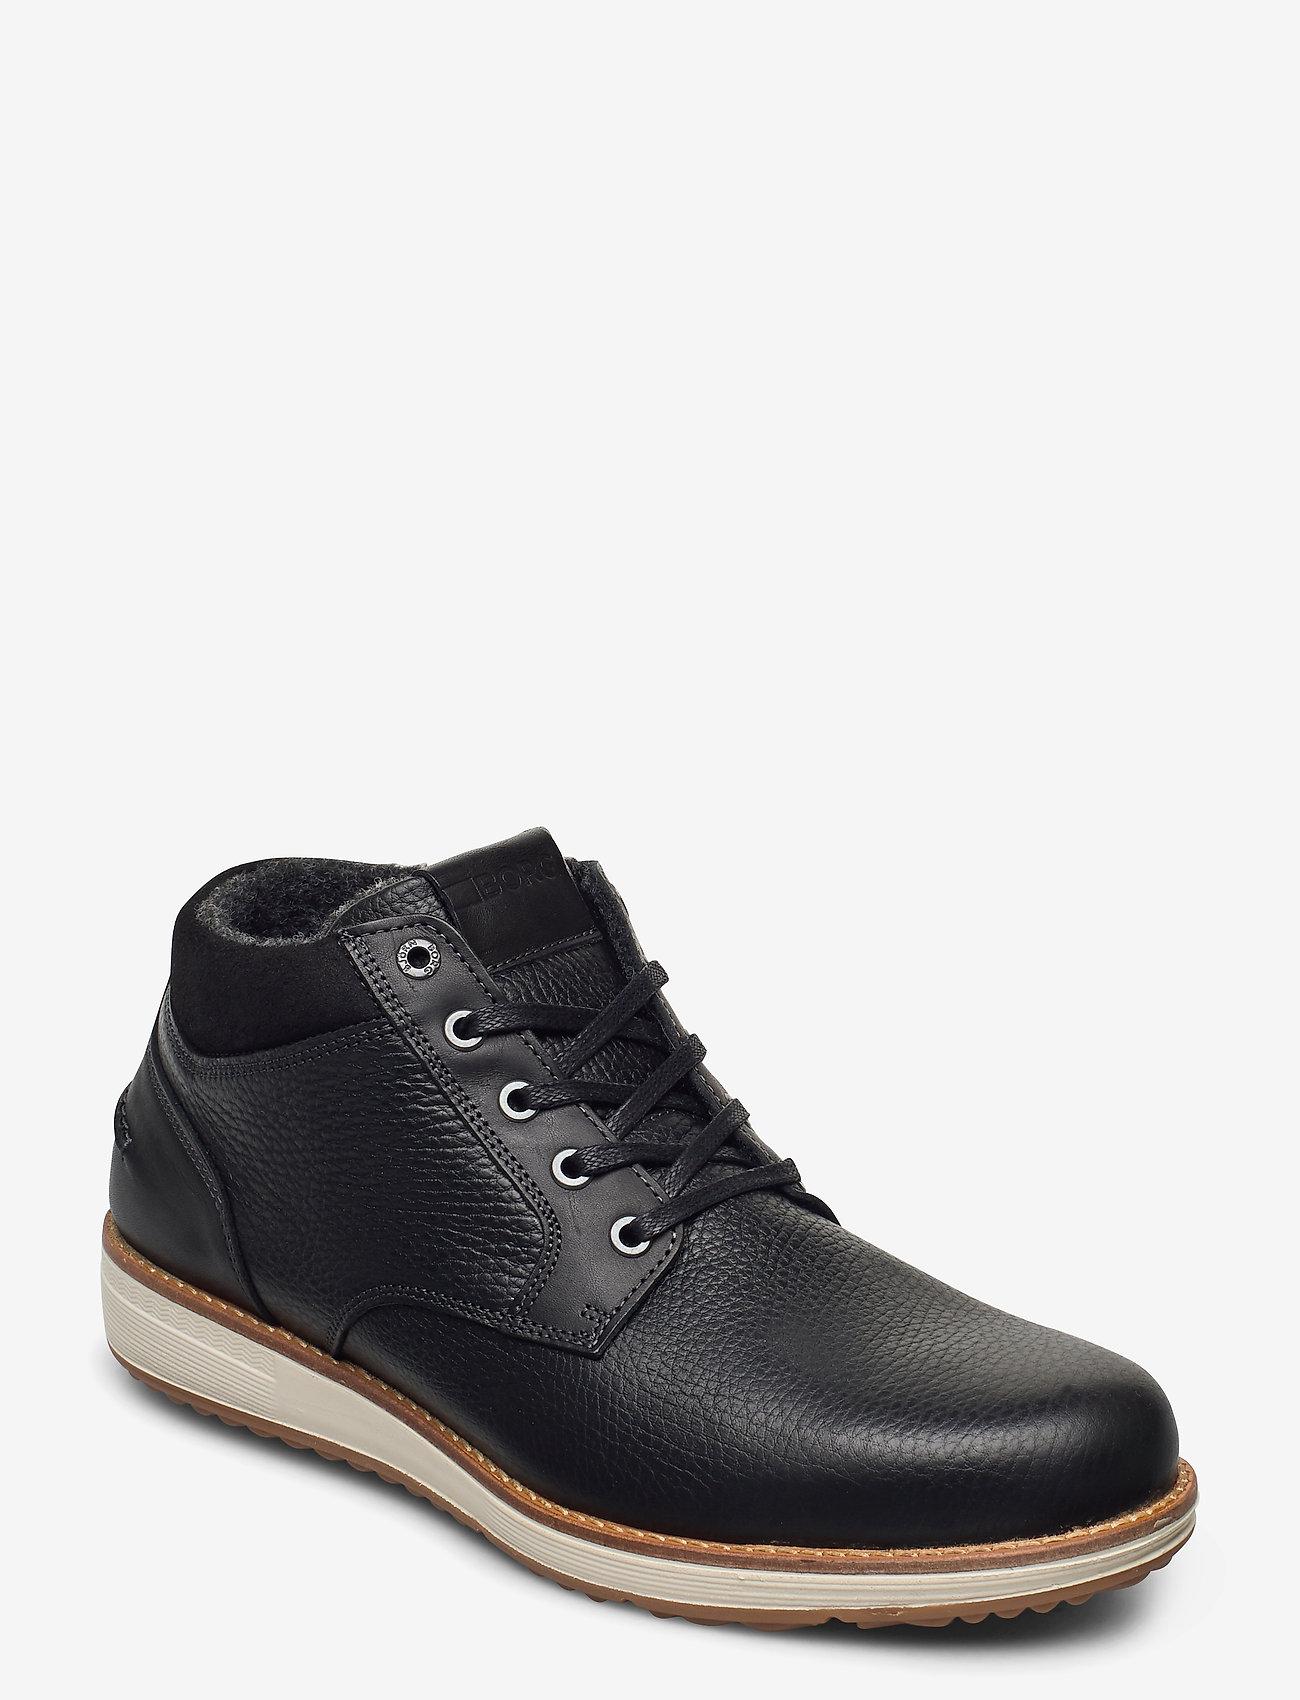 Björn Borg - SUNDAL MID TMB M - laced boots - black - 0